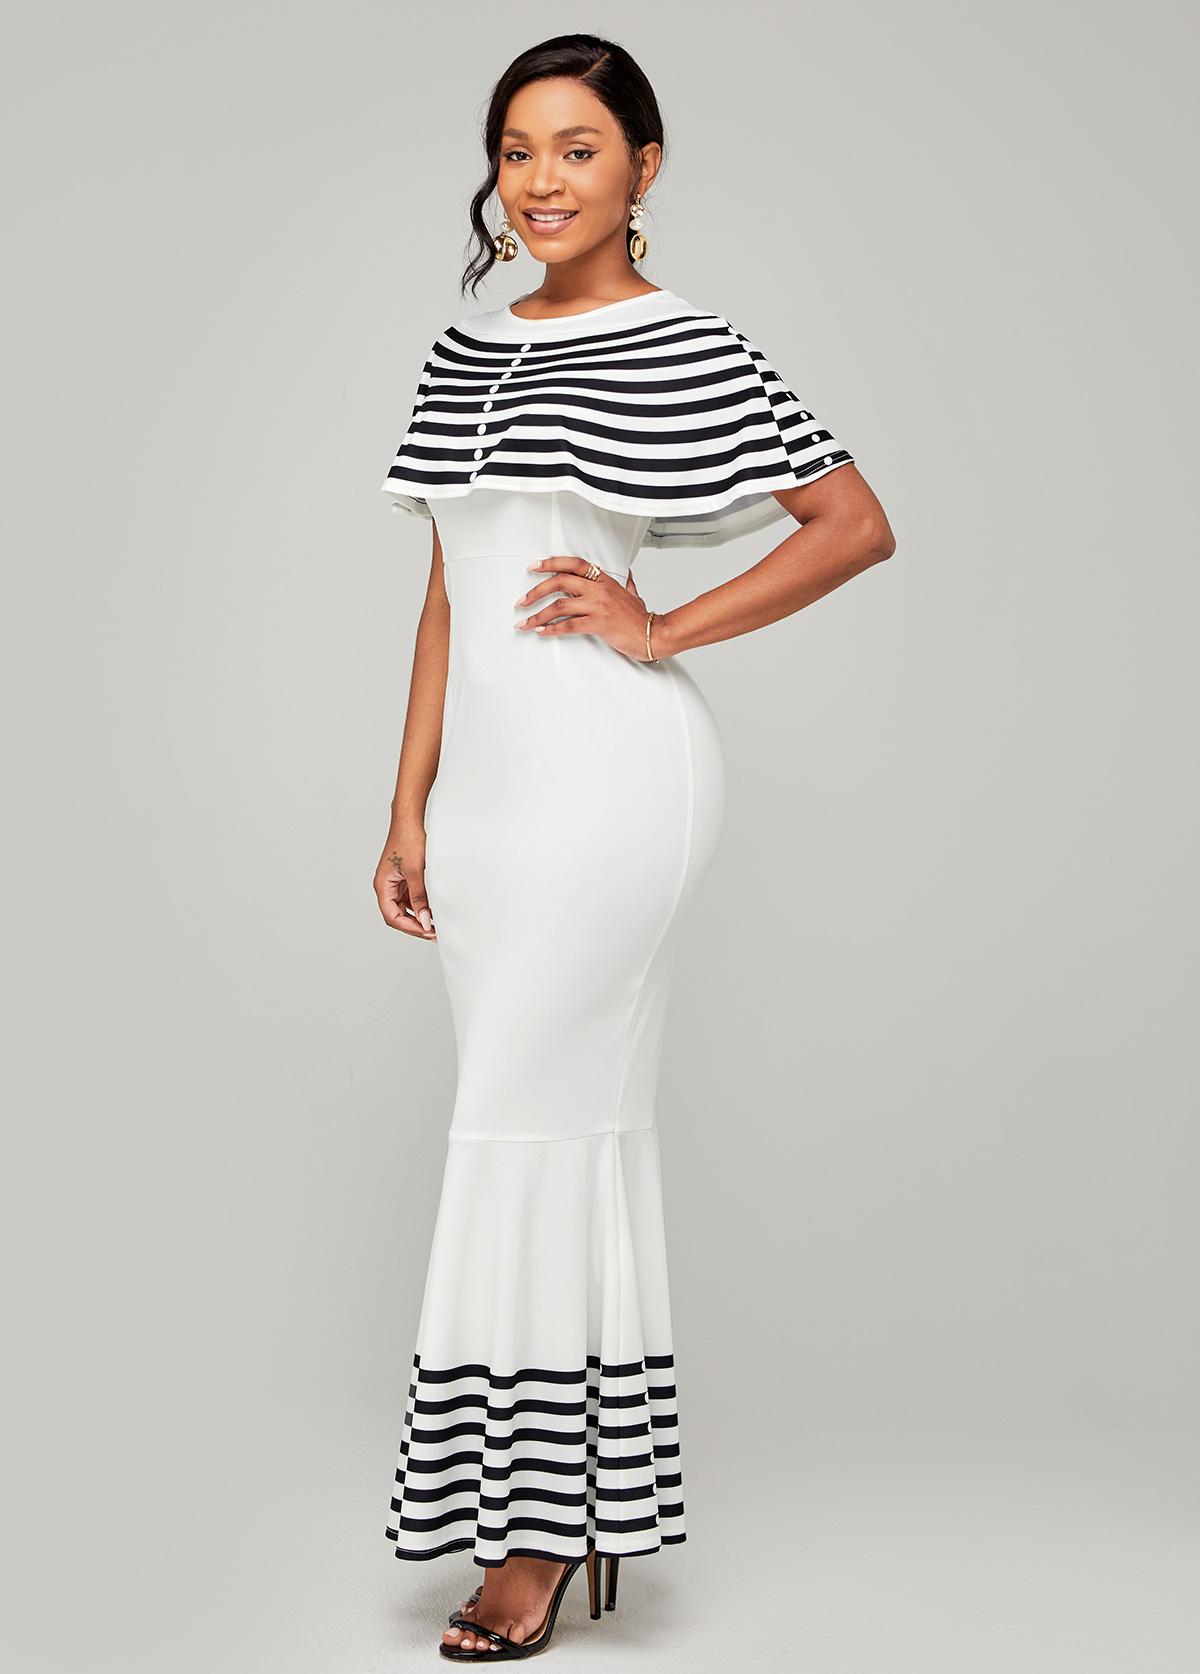 Cape Sleeve Round Neck Striped Mermaid Dress